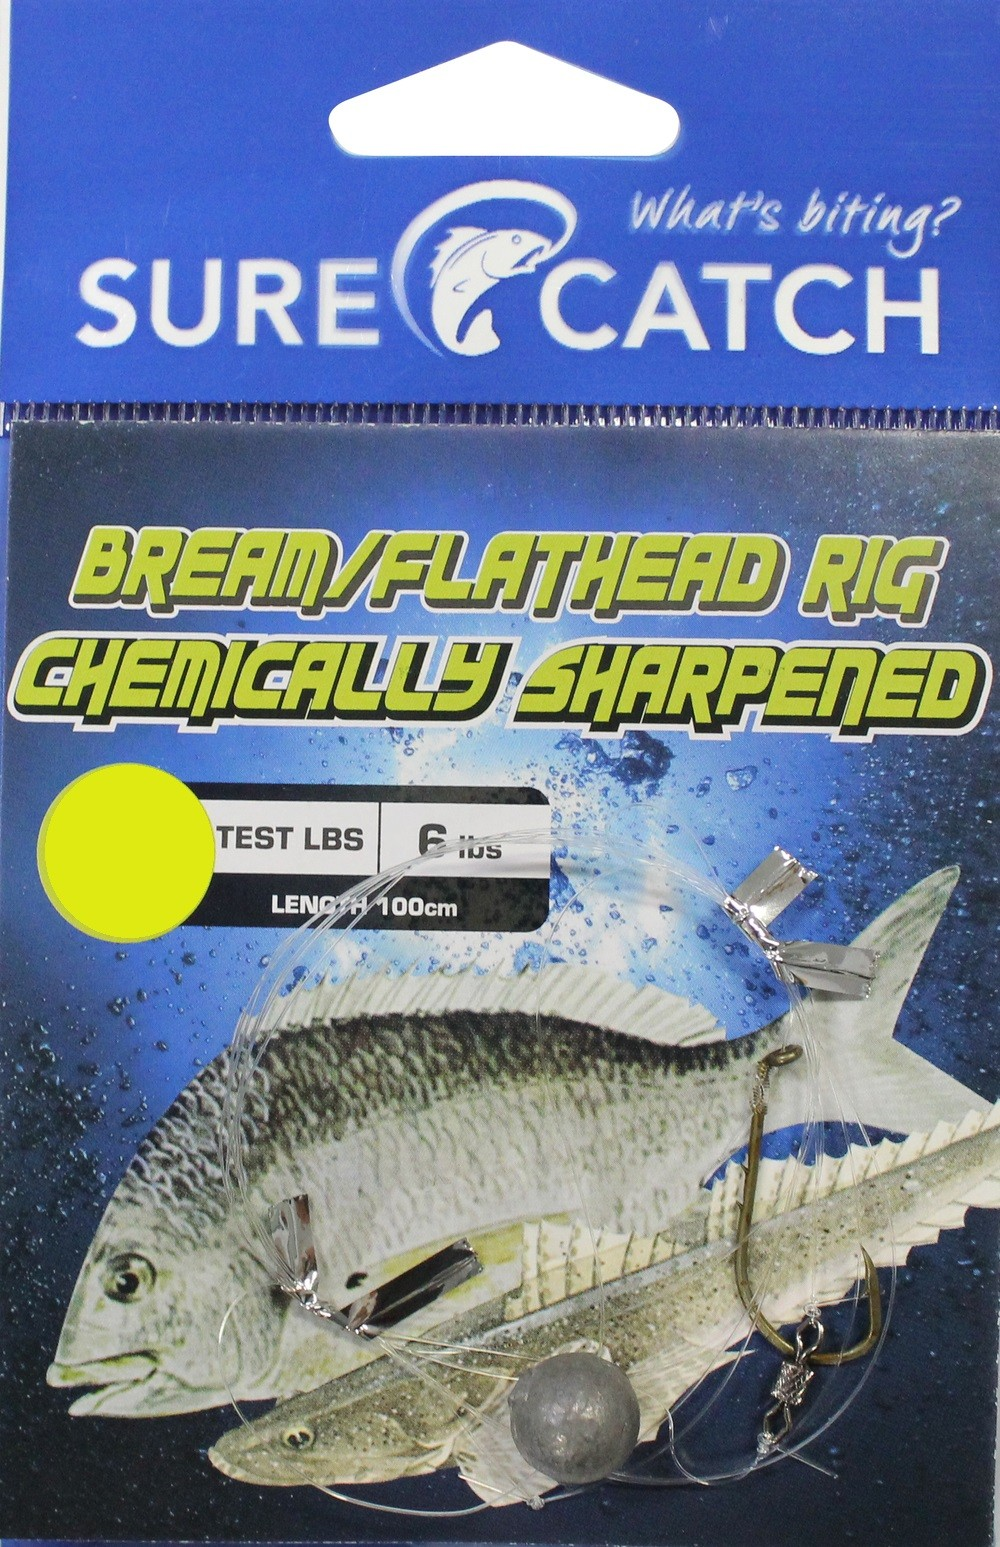 Sure Catch Bream & Flathead Rig Chem/Sharp - Size 2